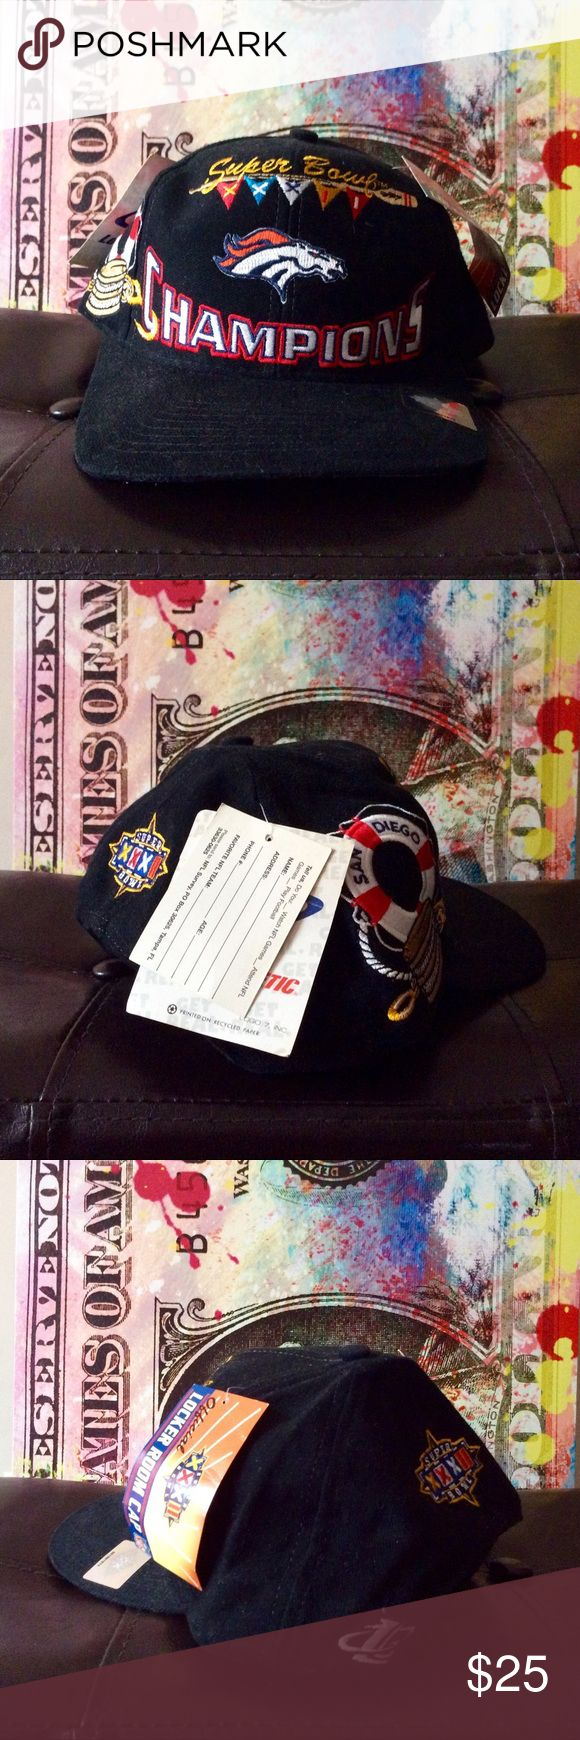 1998 Super Bowl 32 Broncos Championship Snapback Deadstock / Unworn... Logo Athletic Accessories Hats